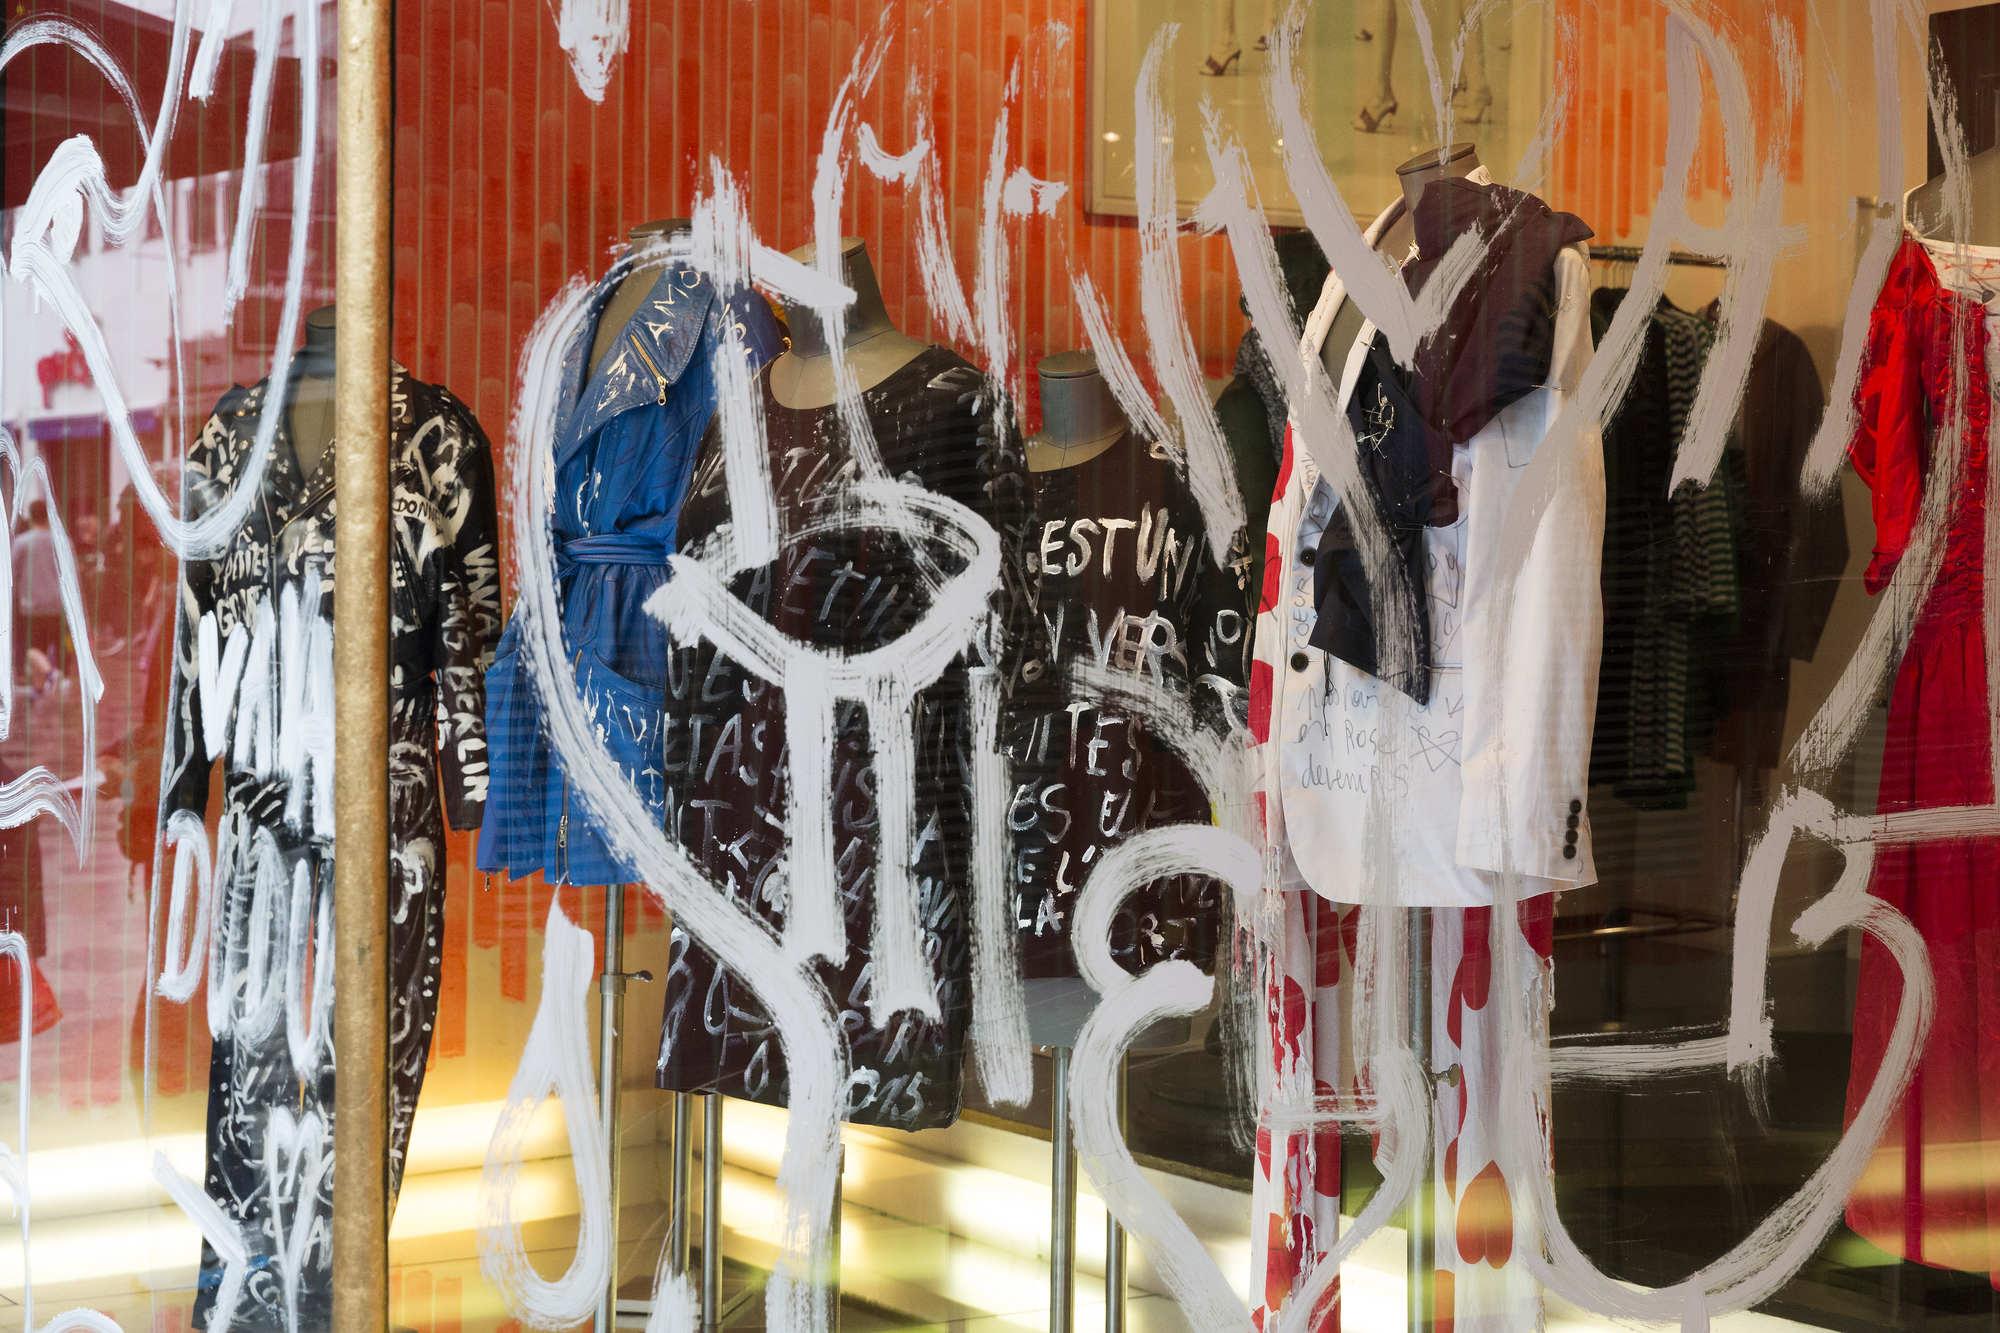 Vava Dudu.The Boutique.Norgaard Paa Stroeget.credit Torben Eskerod2